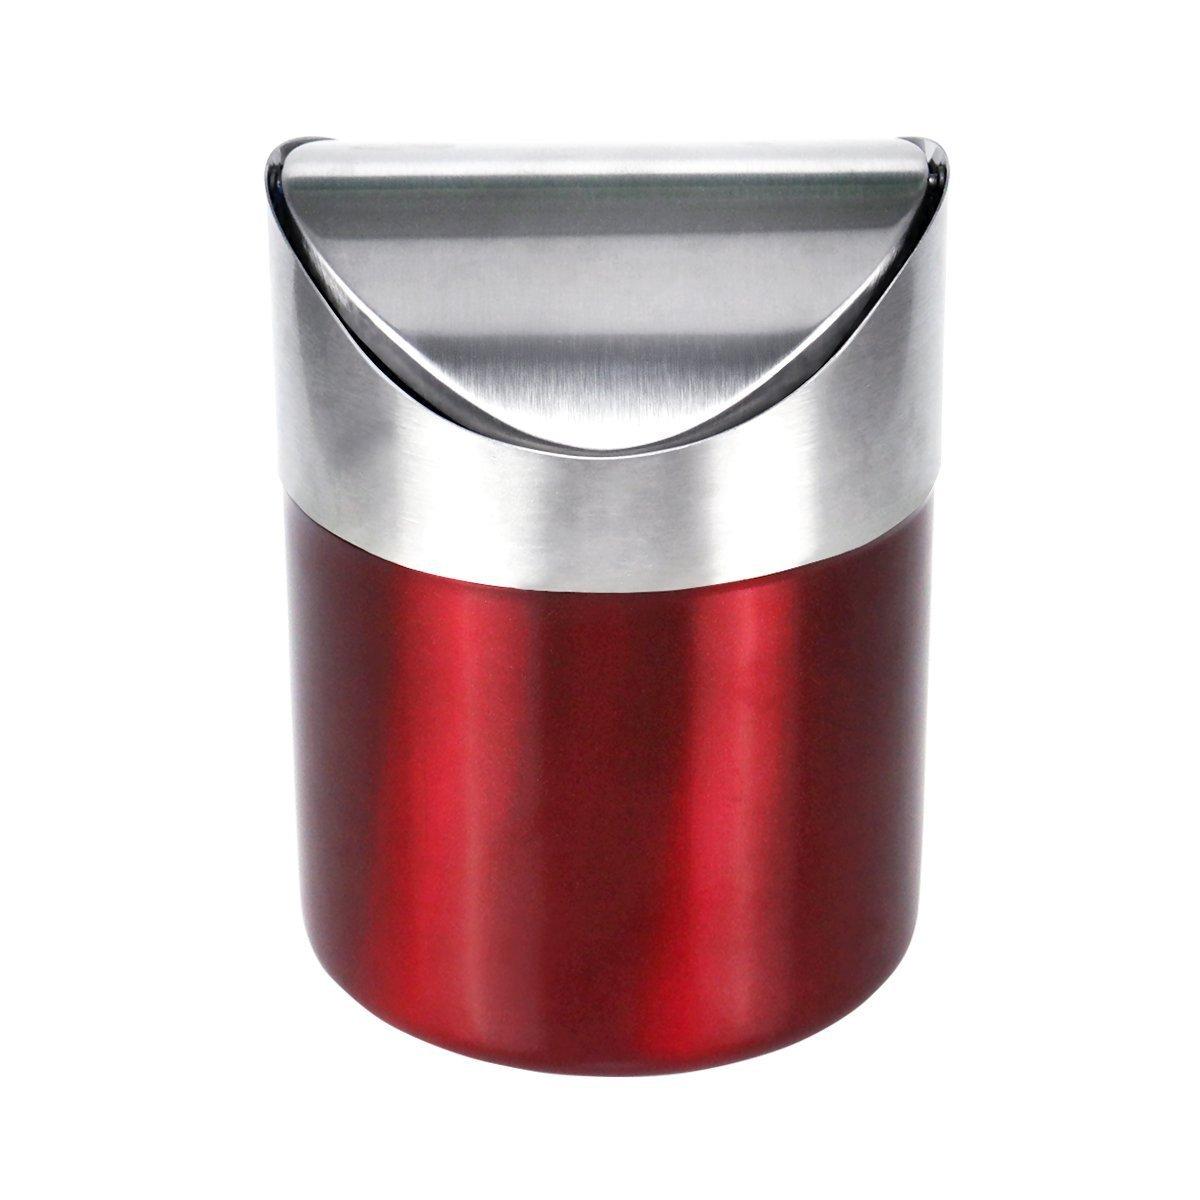 Hofumix Desktop Garbage Can Countertop Trash Can Mini Trash Can Kitchen Desktop Storage Barrels Rubbish Bin Swing Lid Garbage Bin Wastebasket (red)